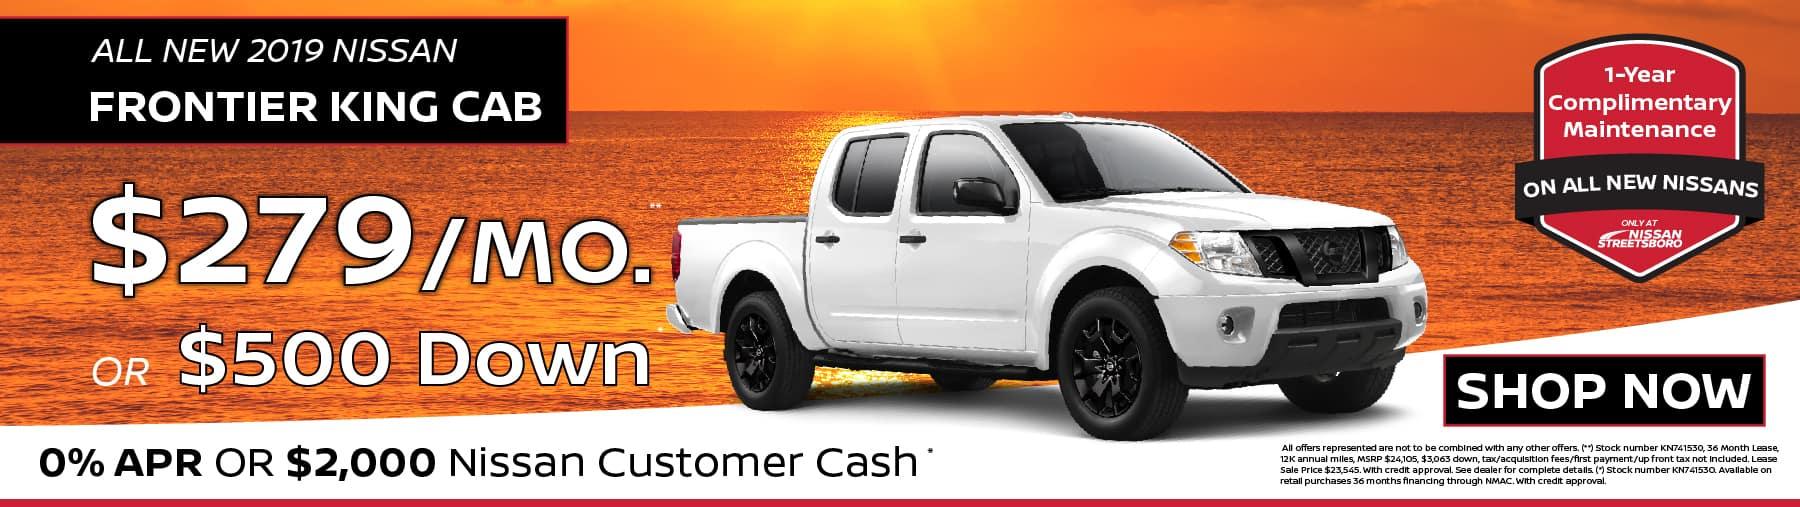 2019 Nissan Frontier Special